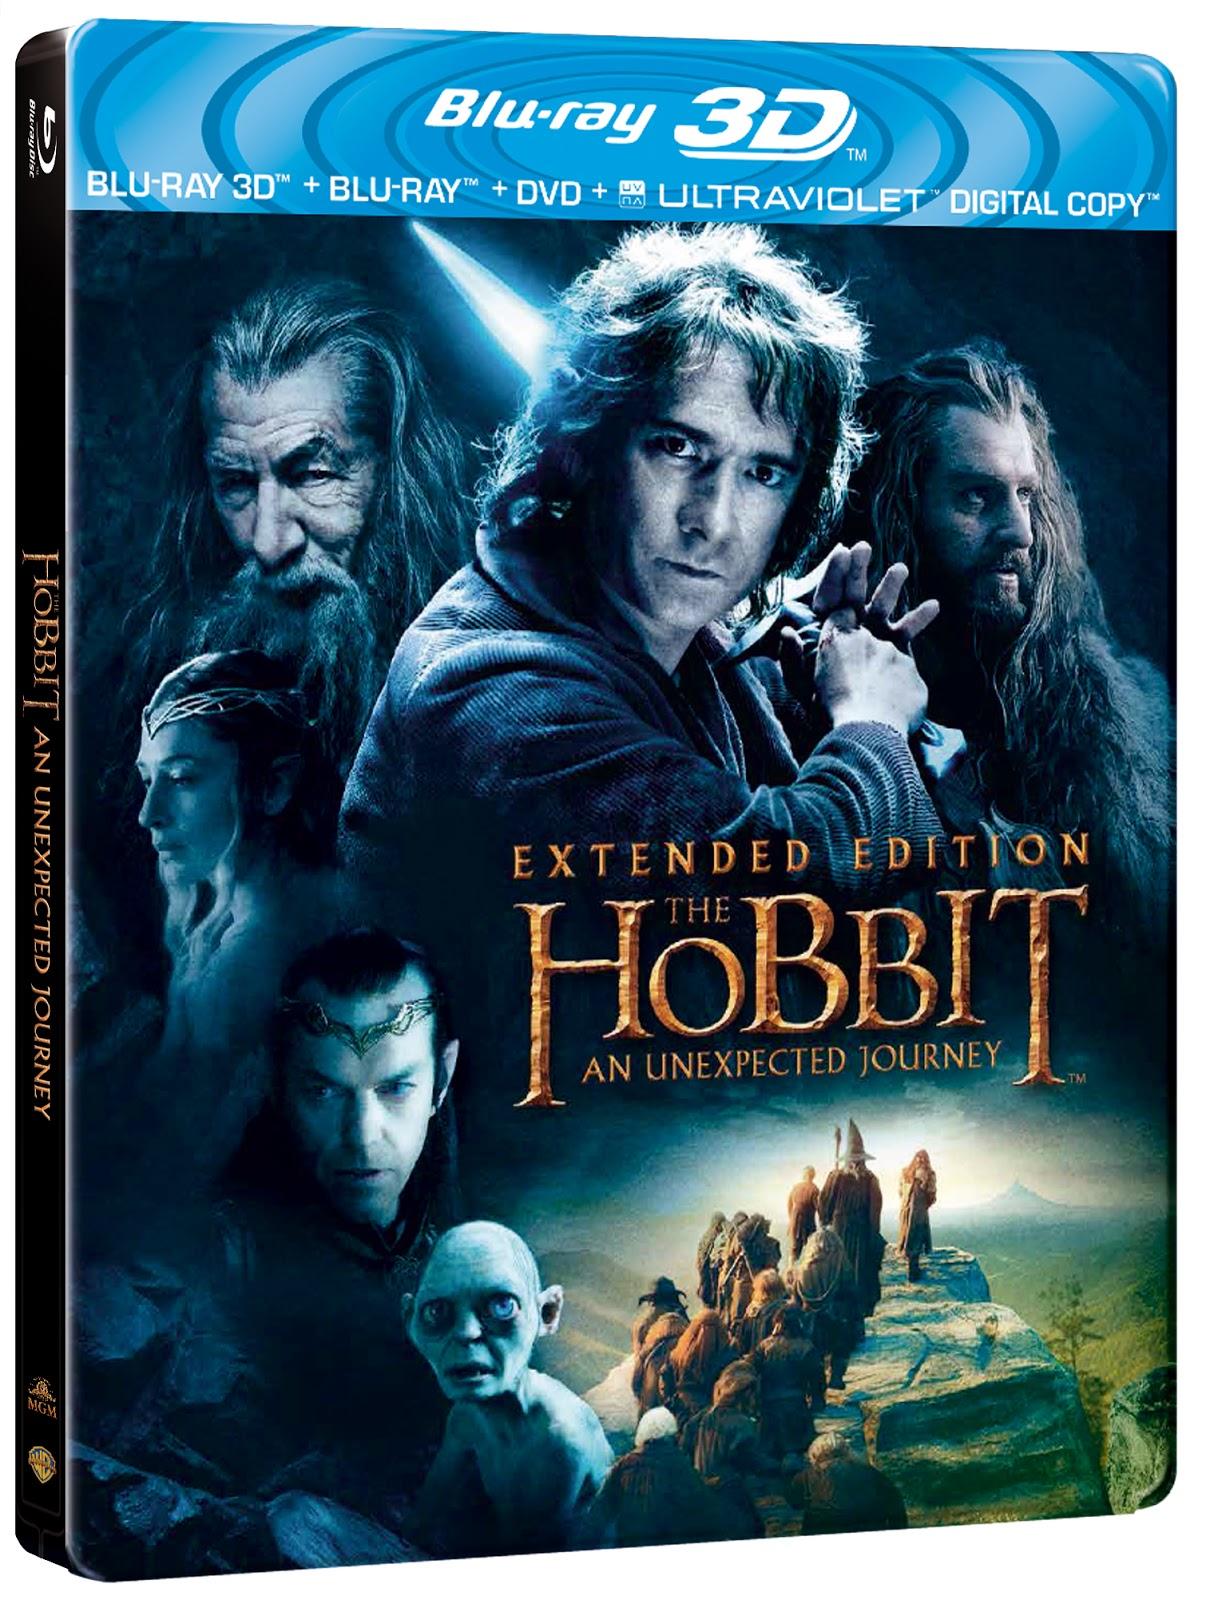 The hobbit release date in Brisbane